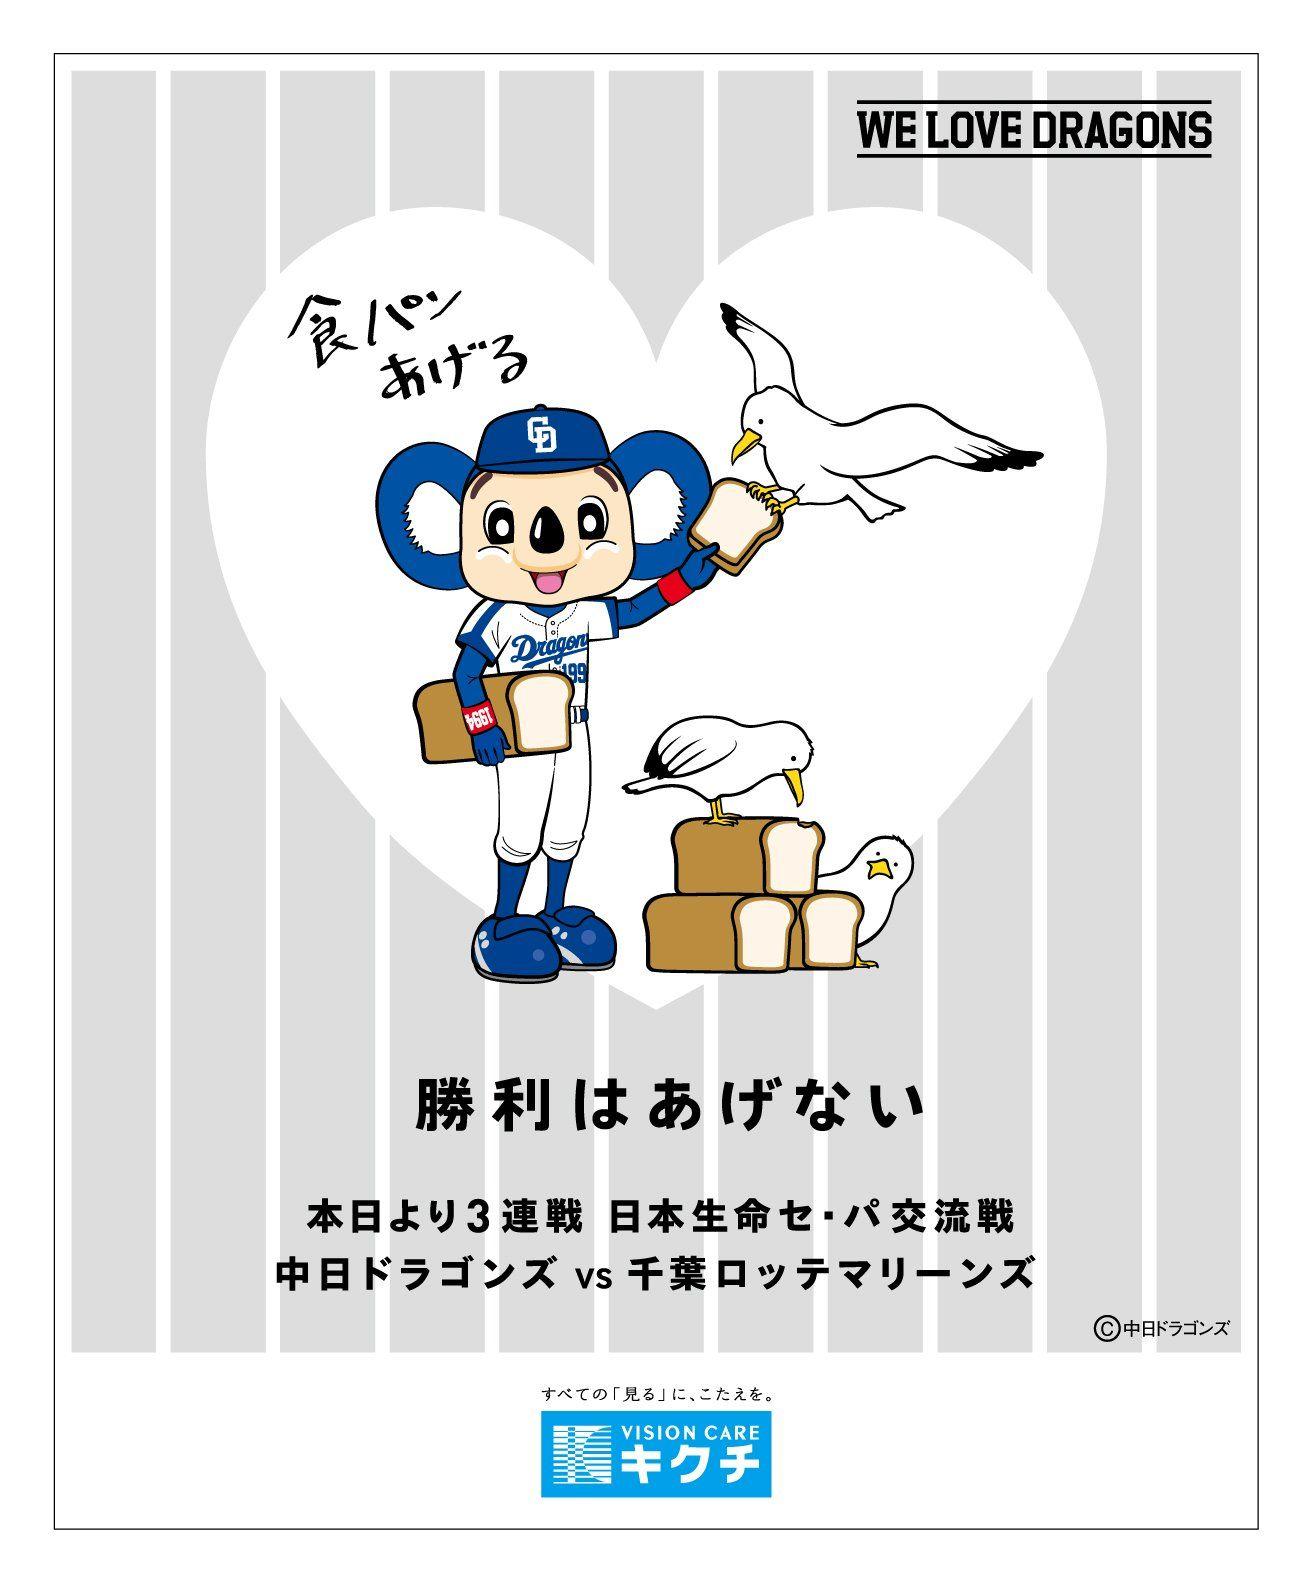 We Love Dragons 交流戦シリーズ広告 面白いポスター ドアラ くま